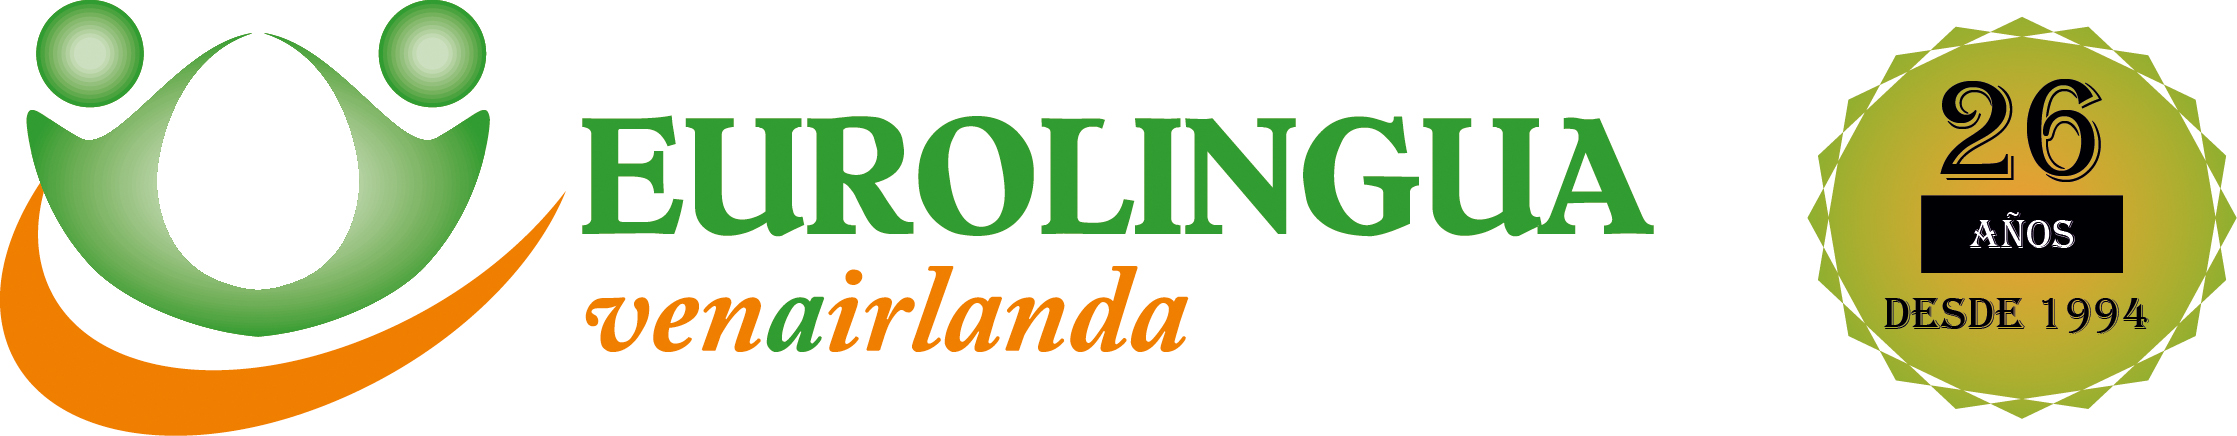 Año Academico en Irlanda - Eurolingua Venairlanda